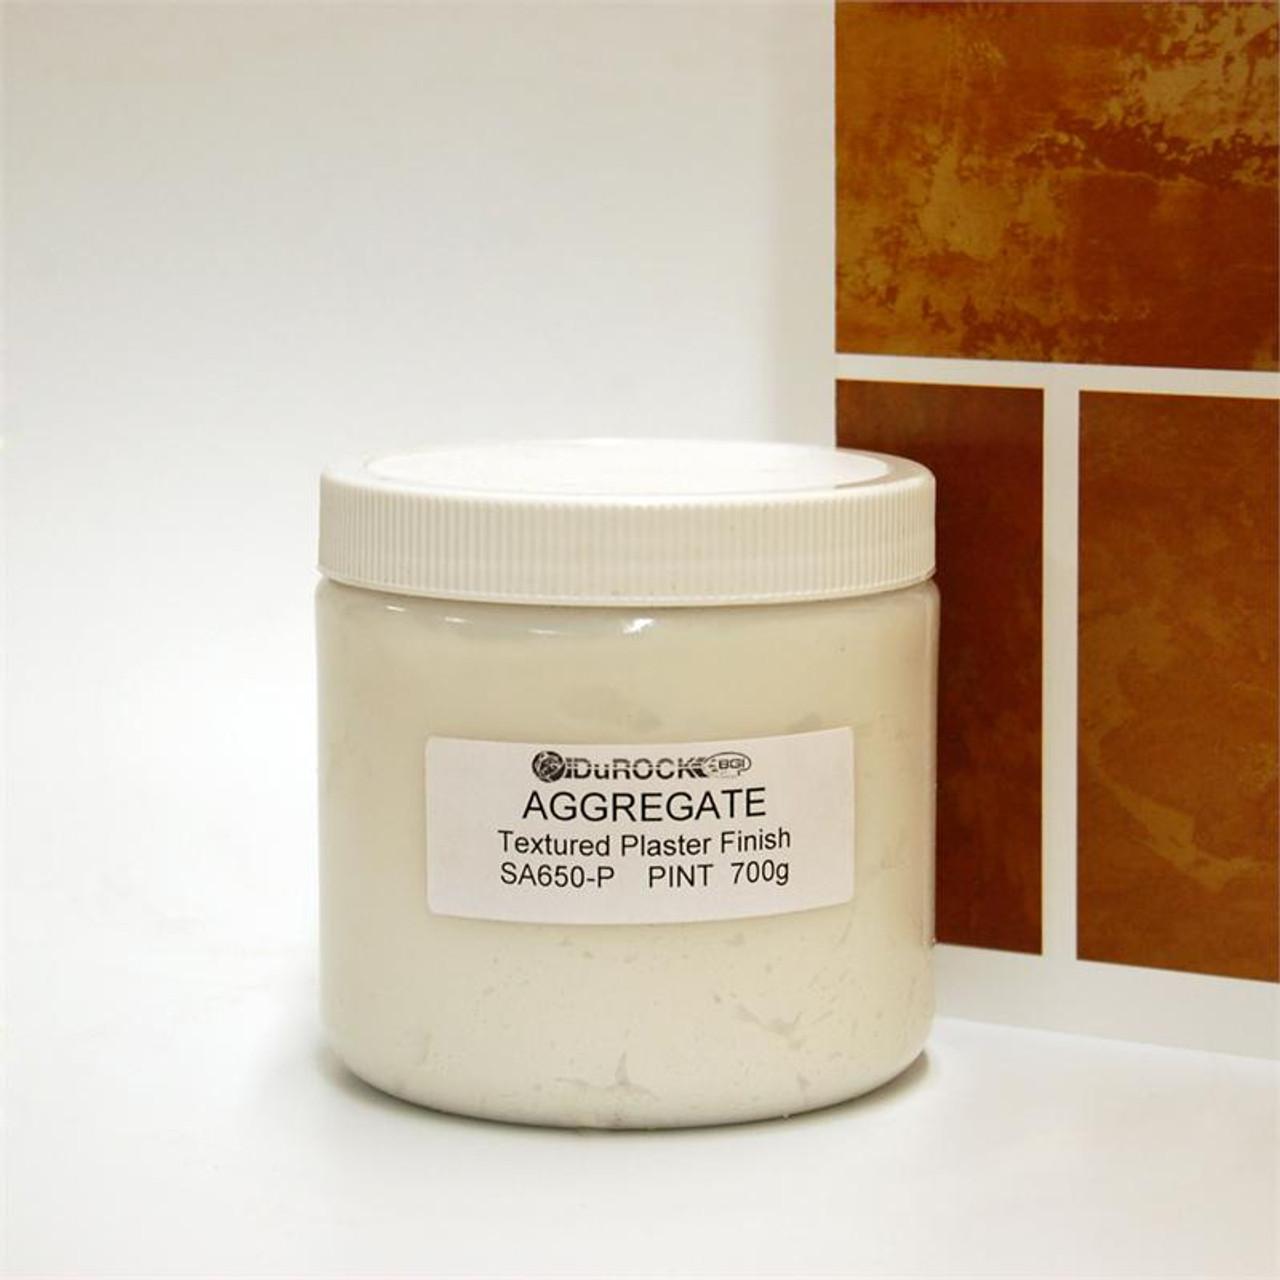 DuRock Aggregate Plaster